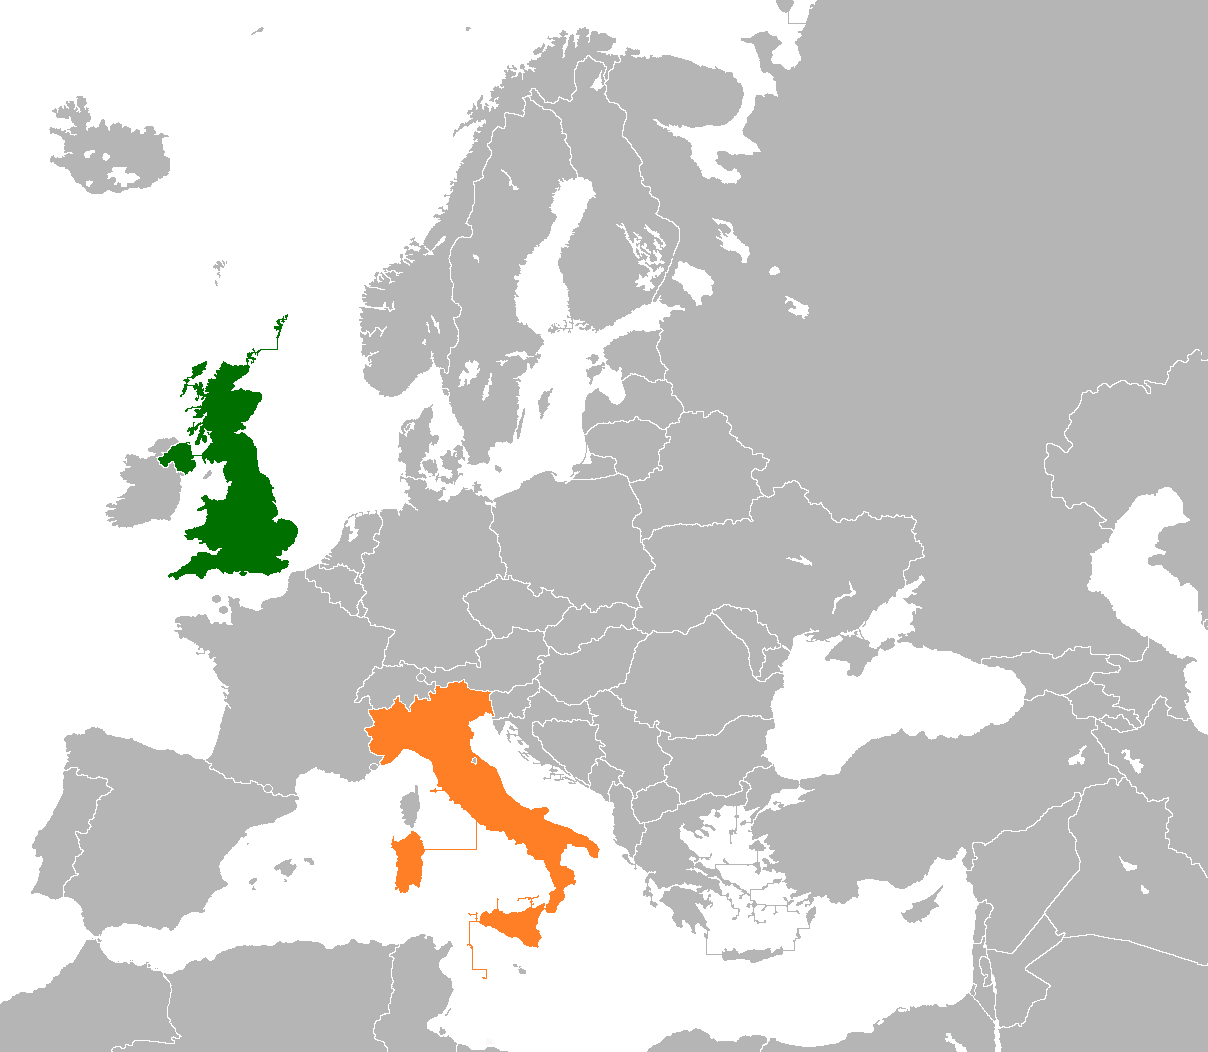 united kingdom and ireland relationship